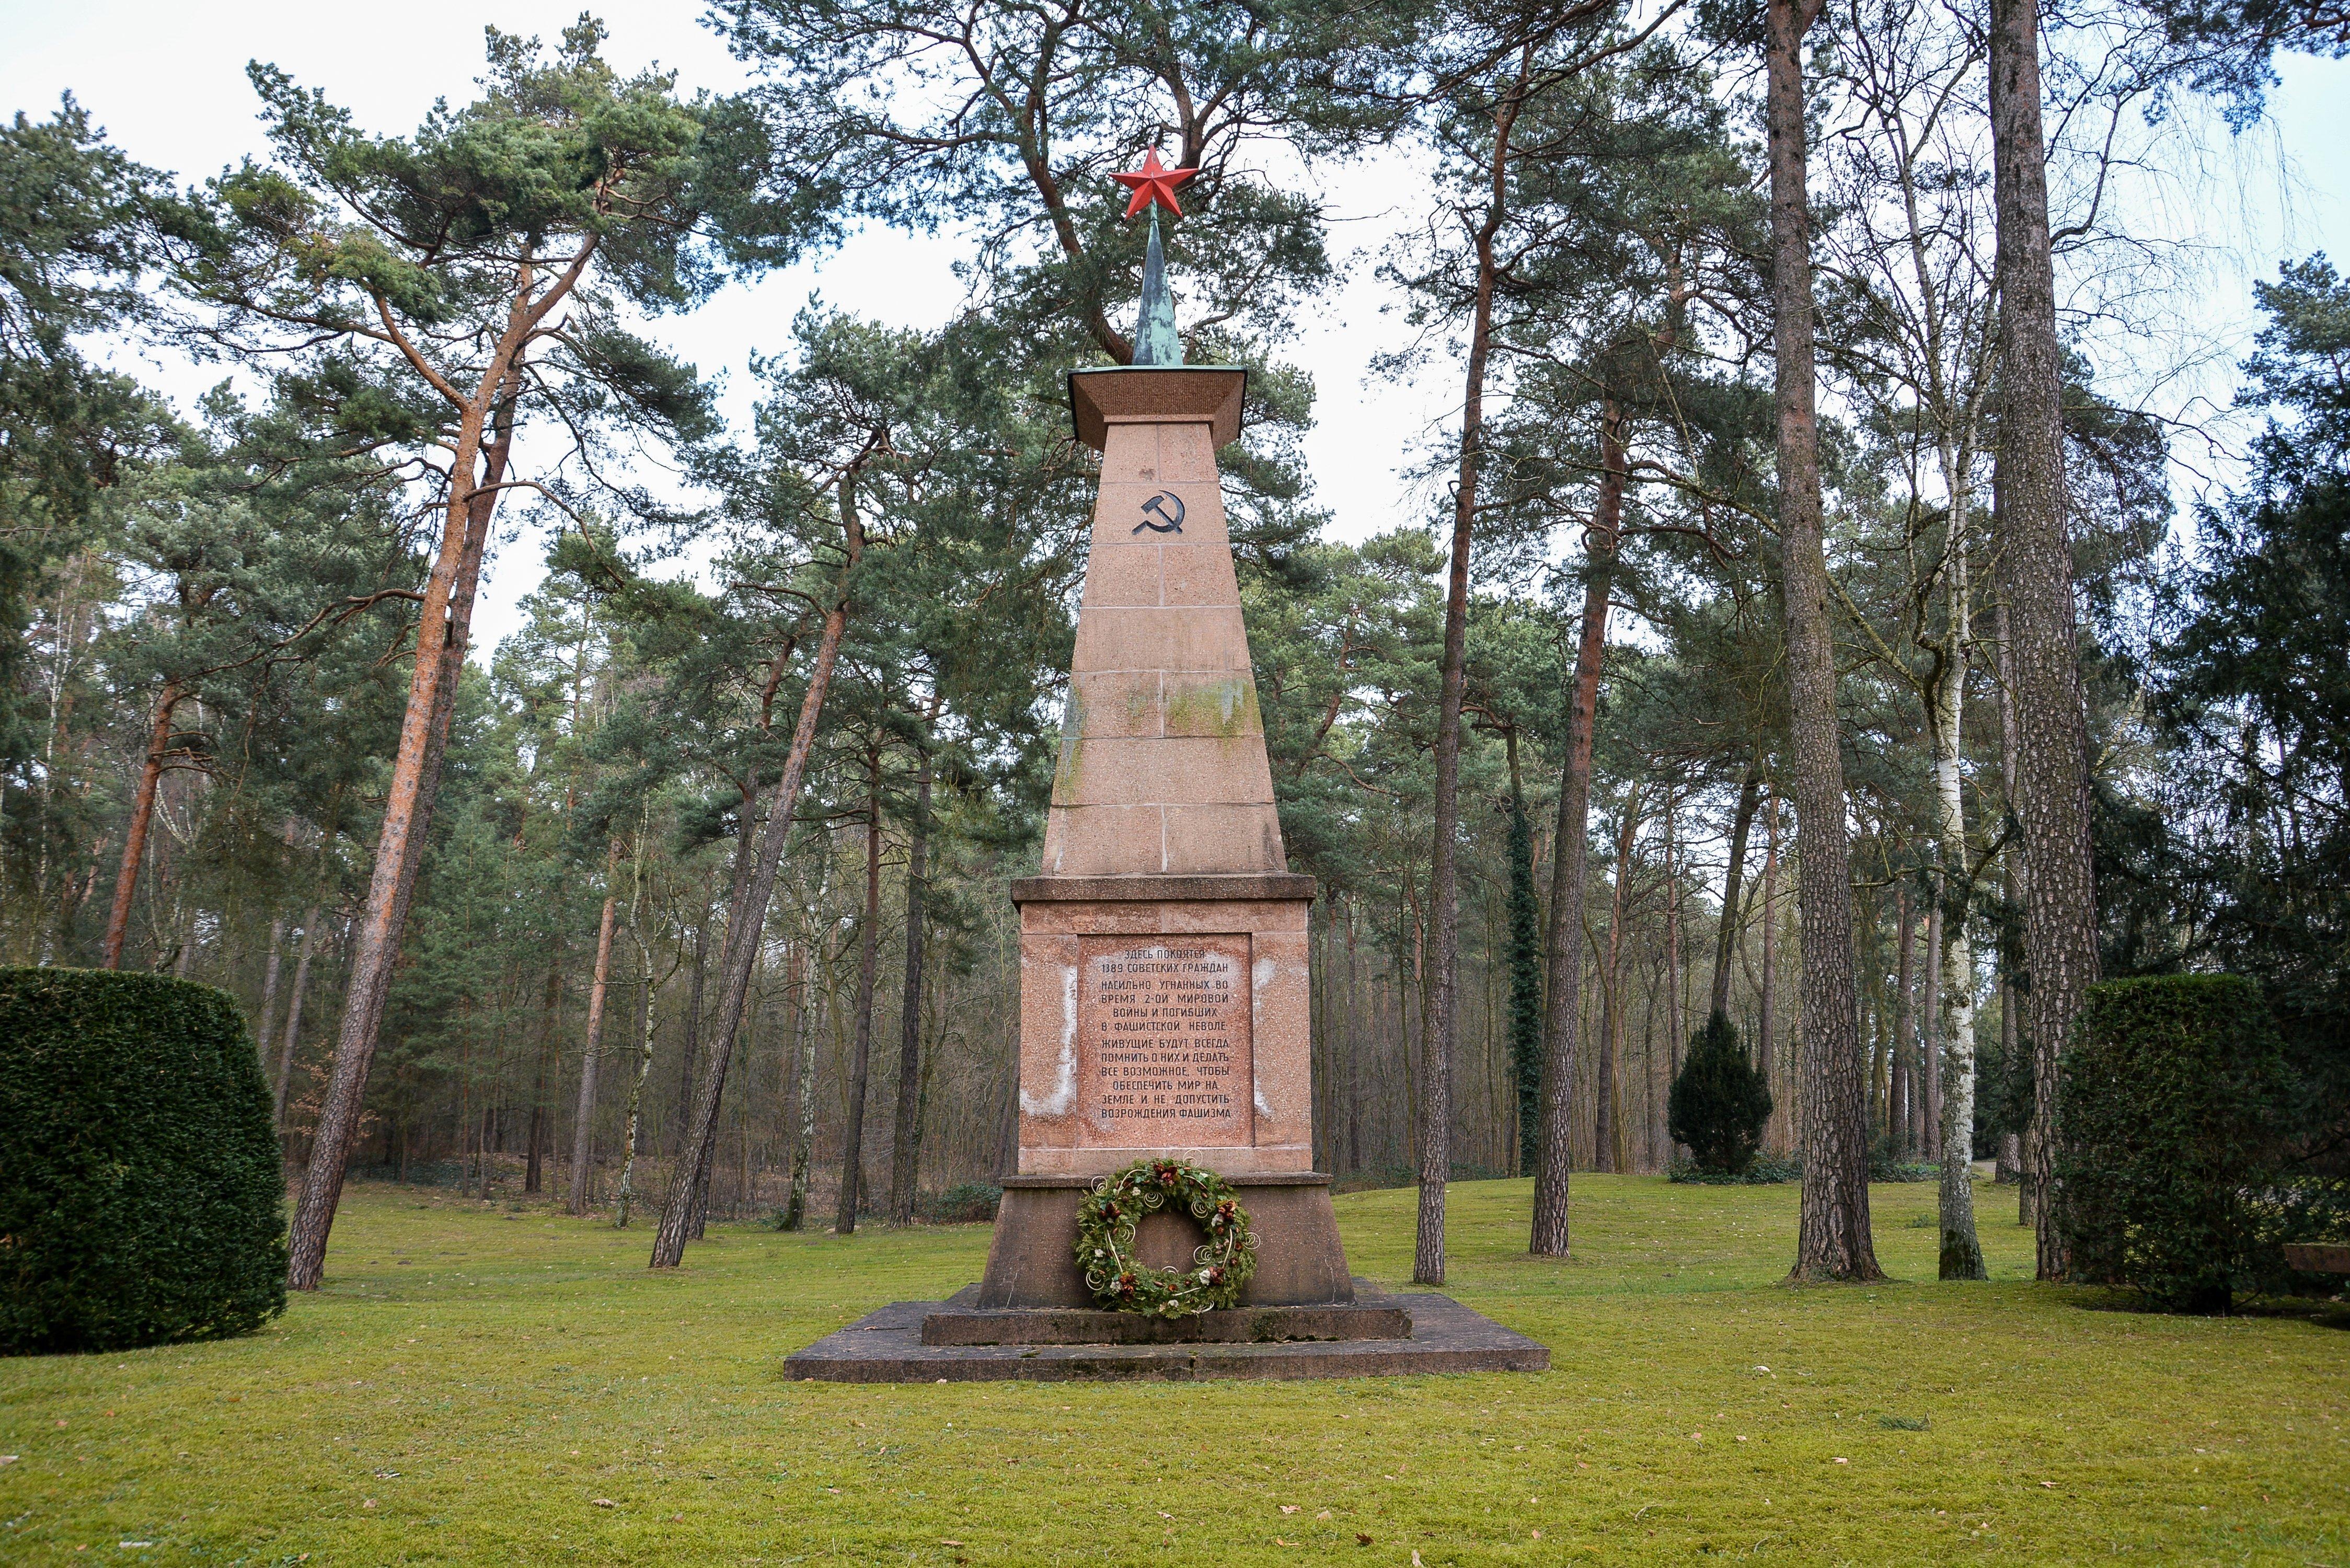 sowjetisches ehrenmal gueterfelde soviet war memorial gueterfelde front obelisk russian monument war graves brandenburg berlin germany